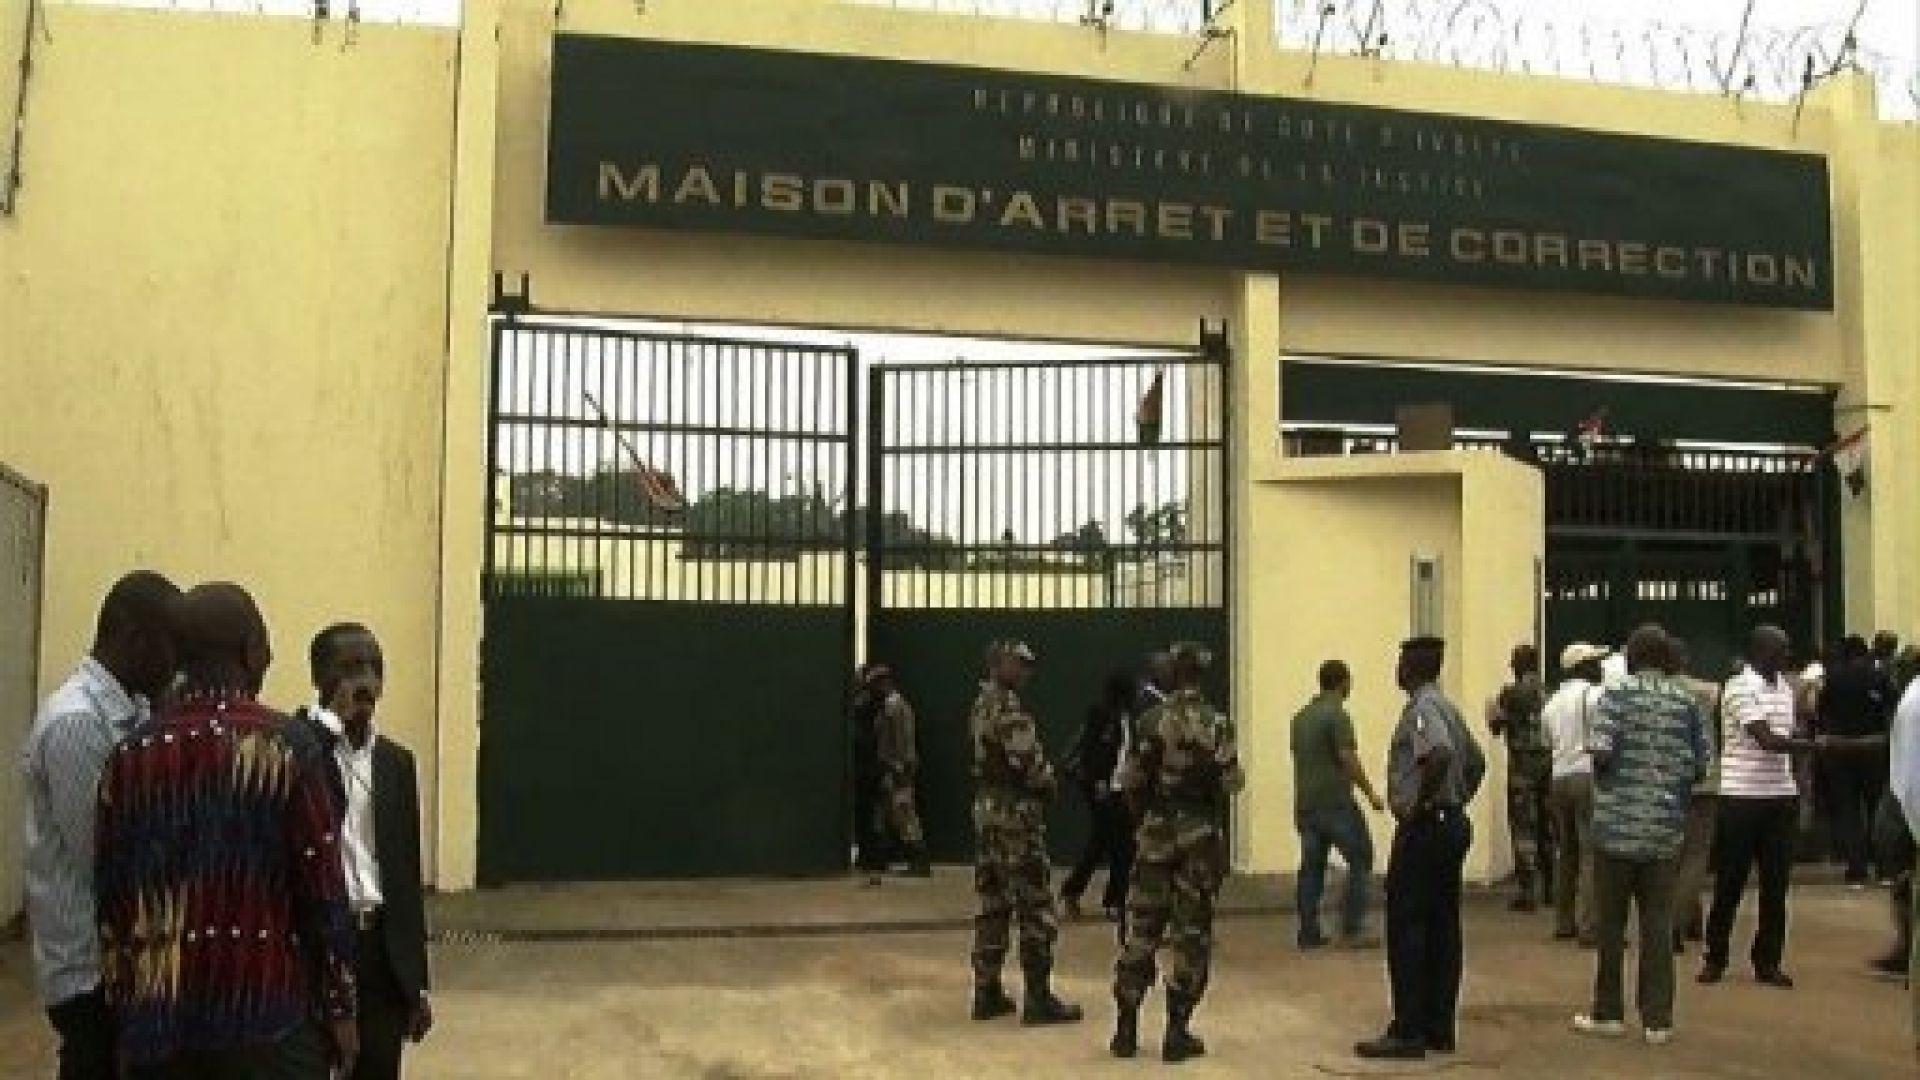 coronavirus-ouattara-accorde-la-grace-presidentielle-a-plus-de-2000-detenus